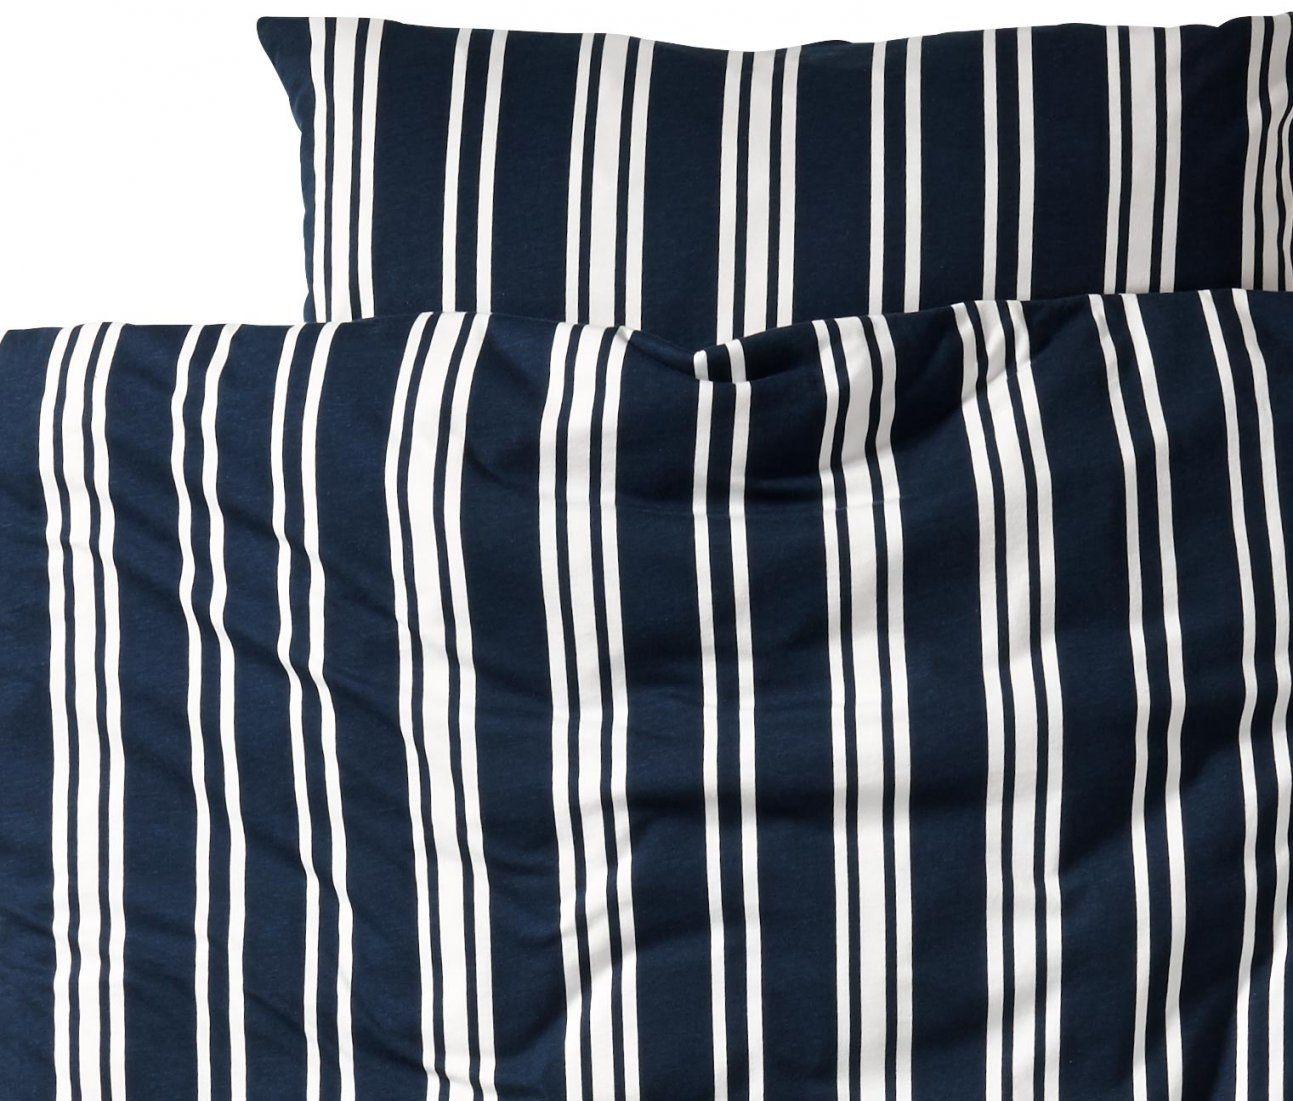 tchibo bettw sche 155x220 haus design ideen. Black Bedroom Furniture Sets. Home Design Ideas